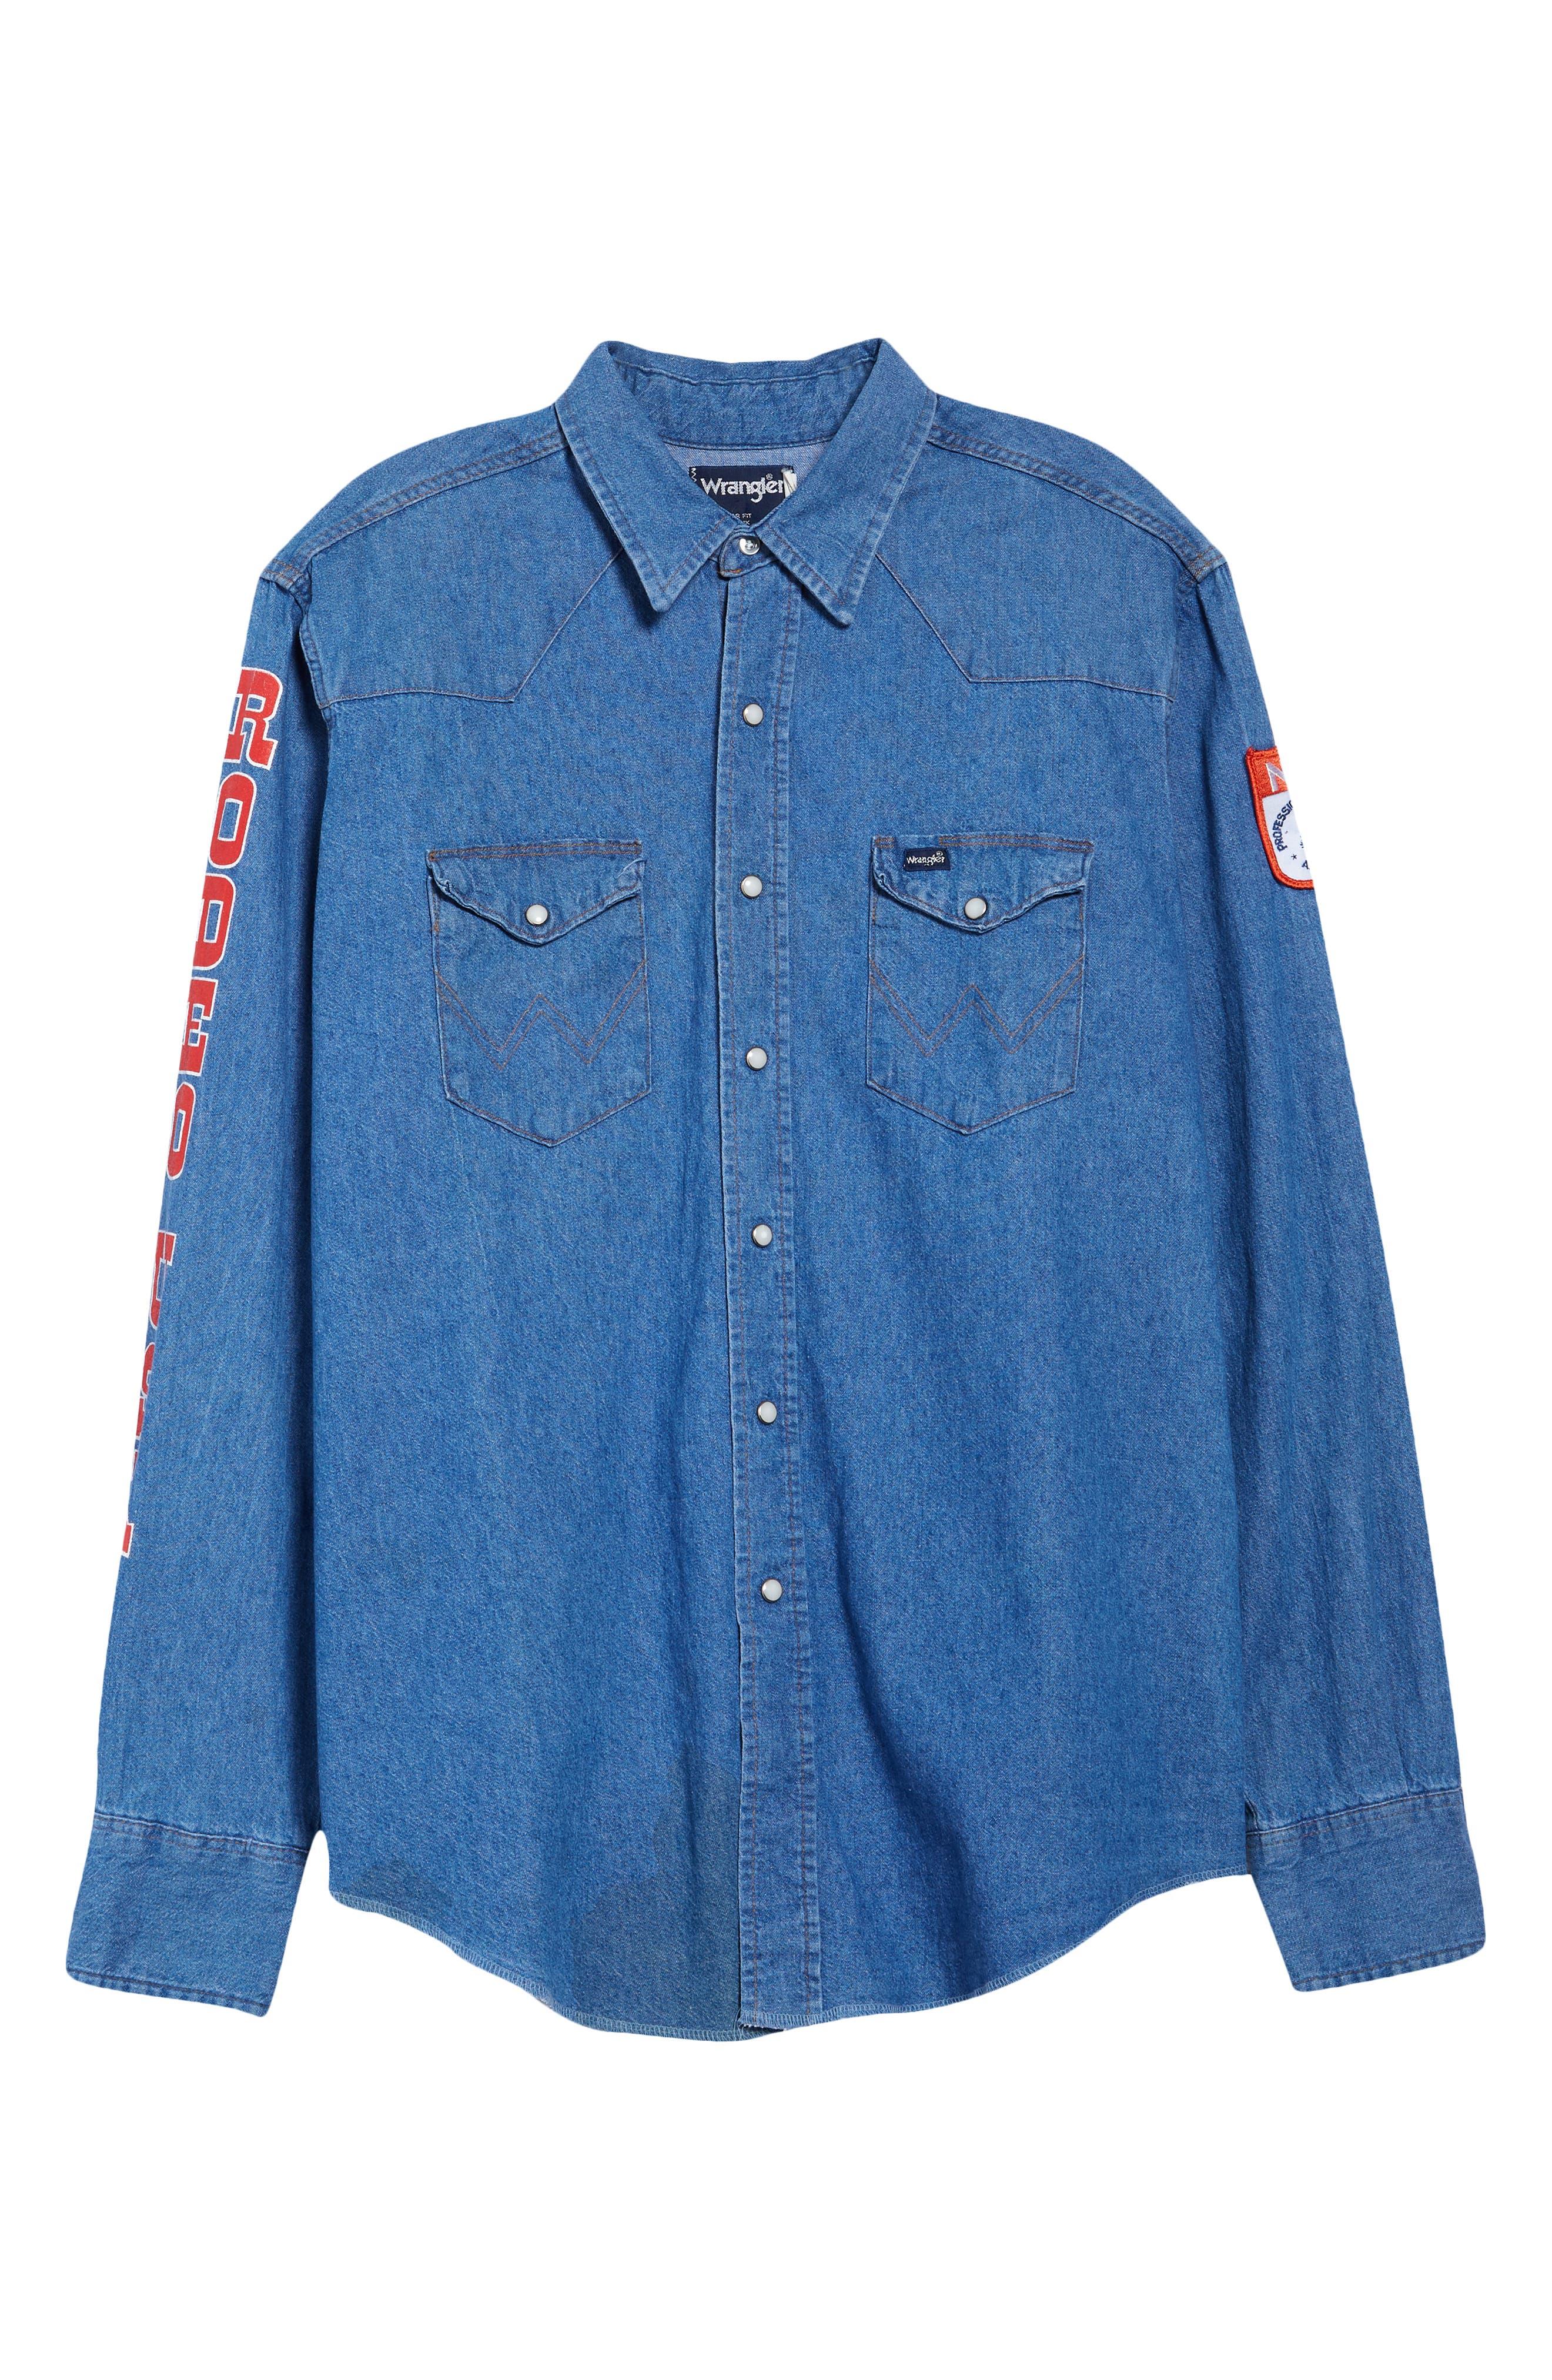 Unisex Vintage '94 Nfr Button-Down Shirt